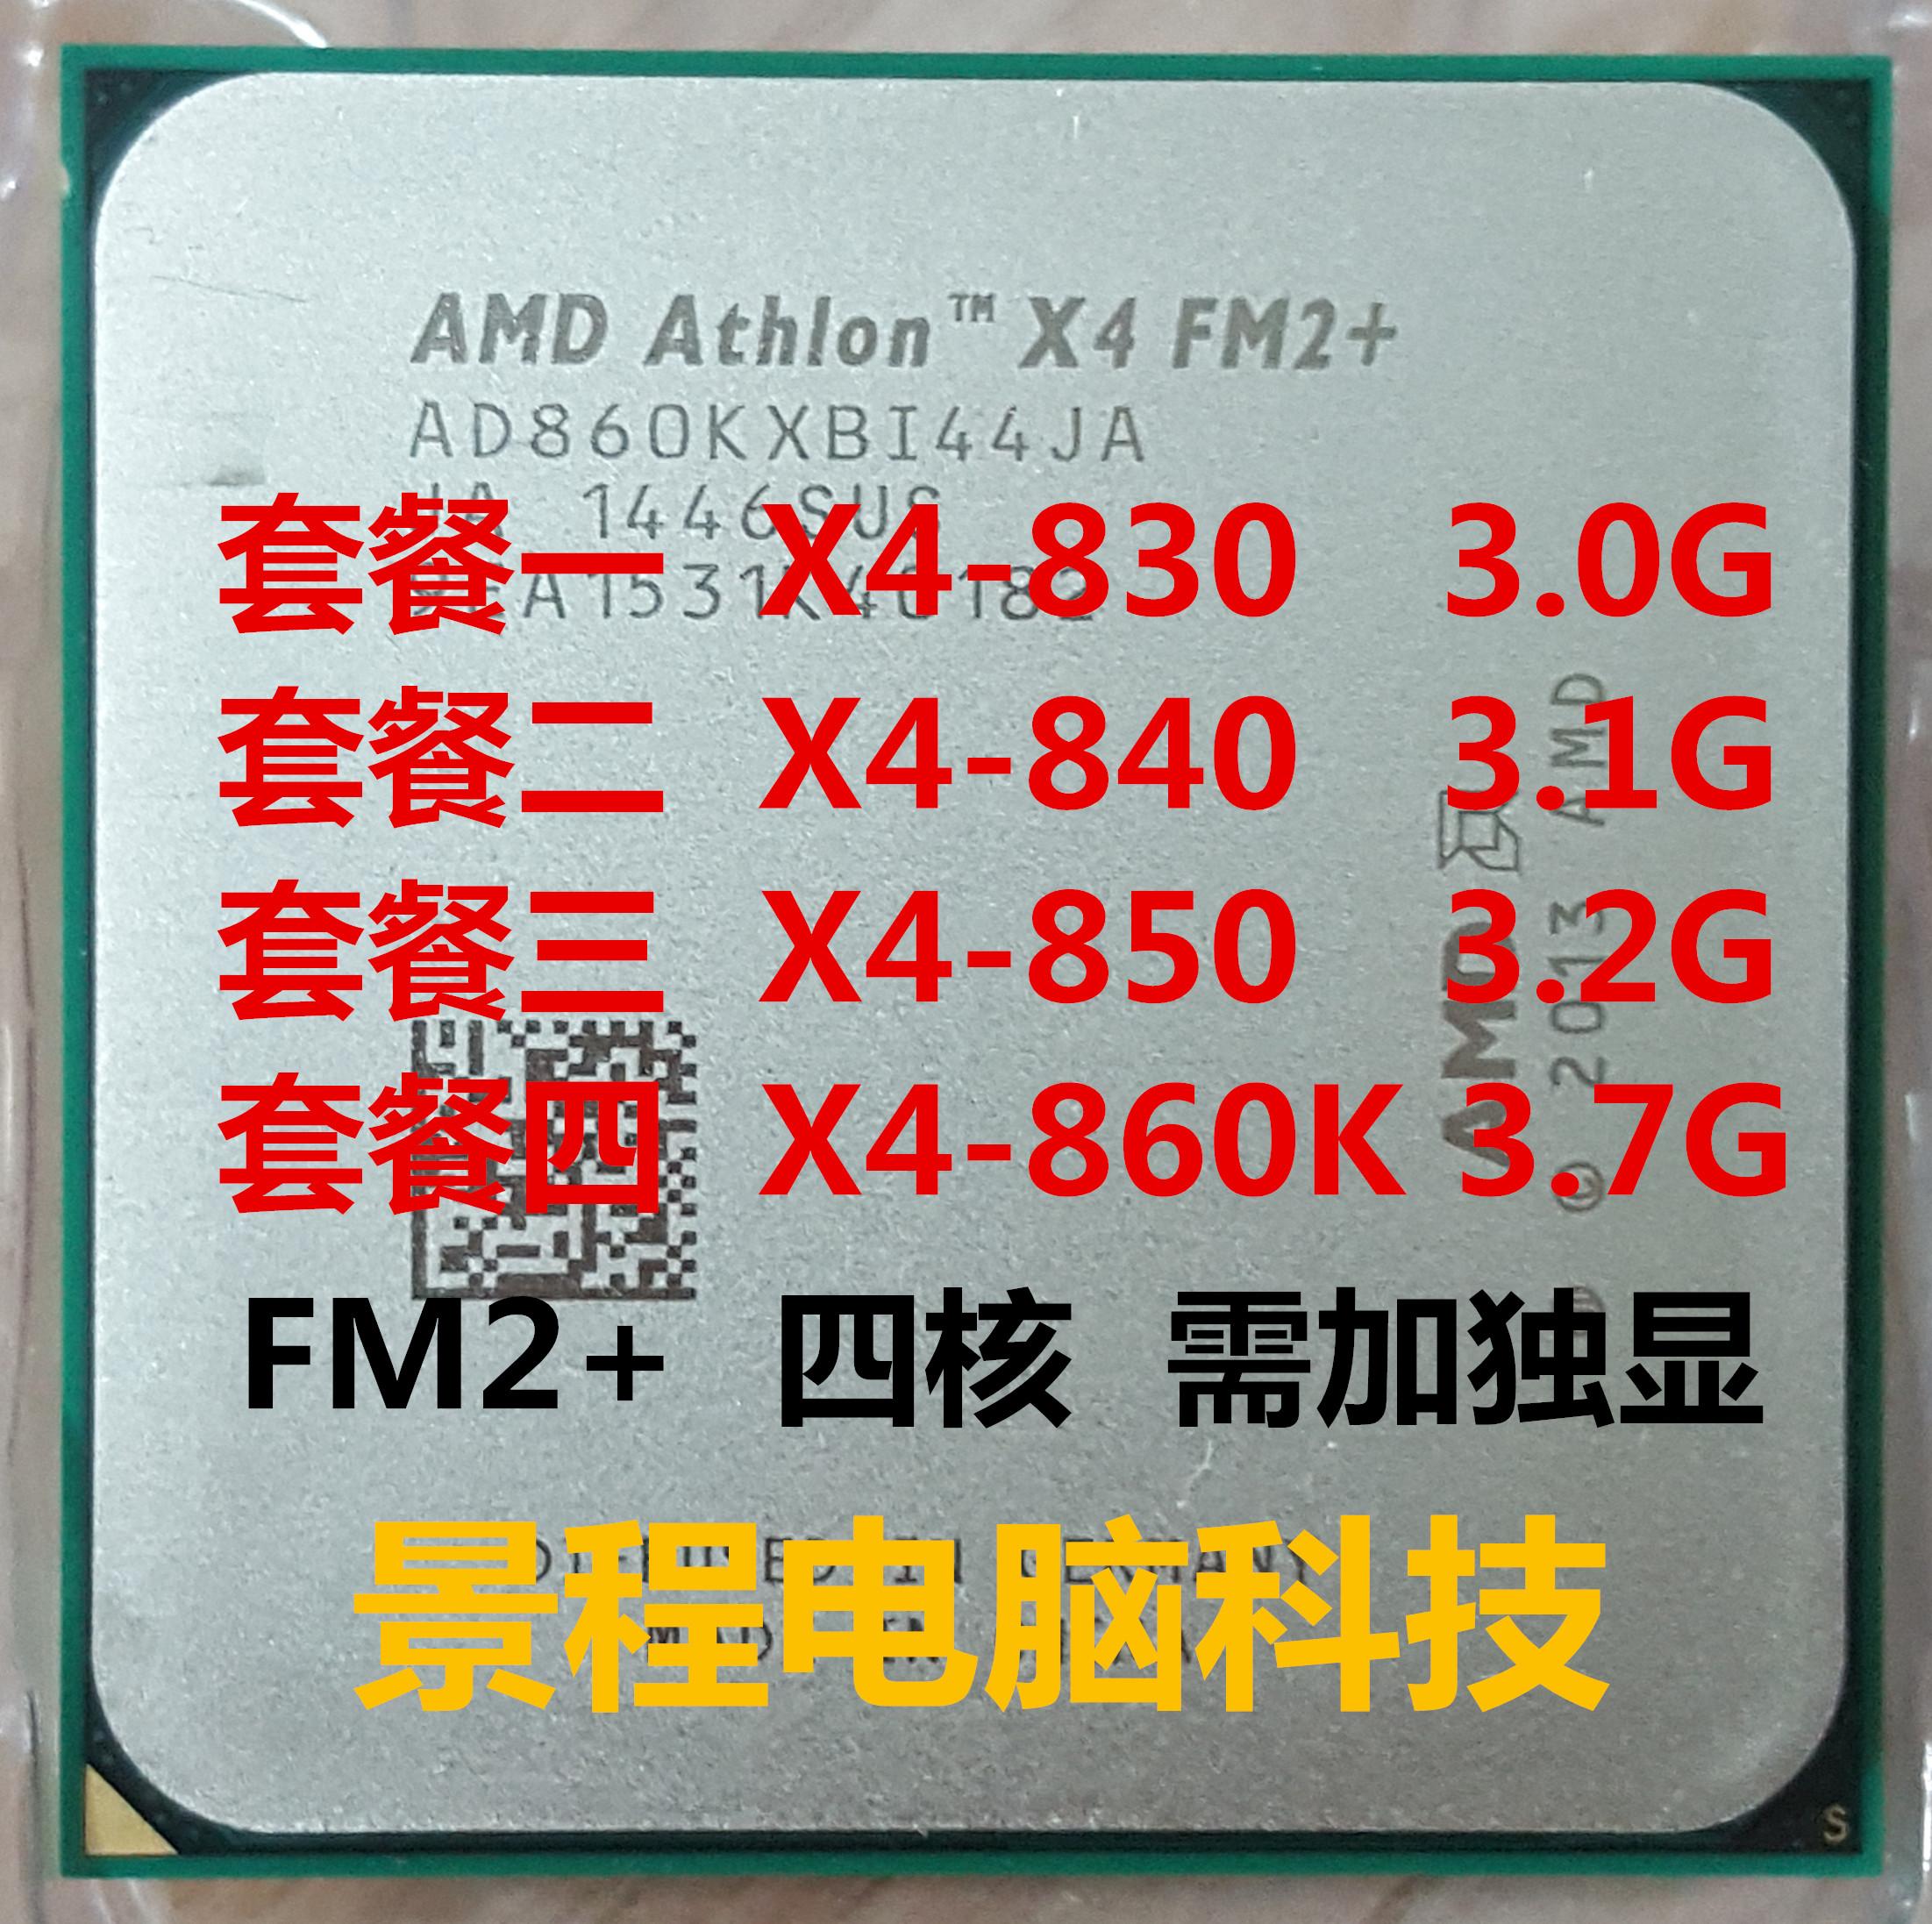 AMD速龙 X4 830 840 850 860k 速龙 四核 台式机CPU FM2+ 无集显